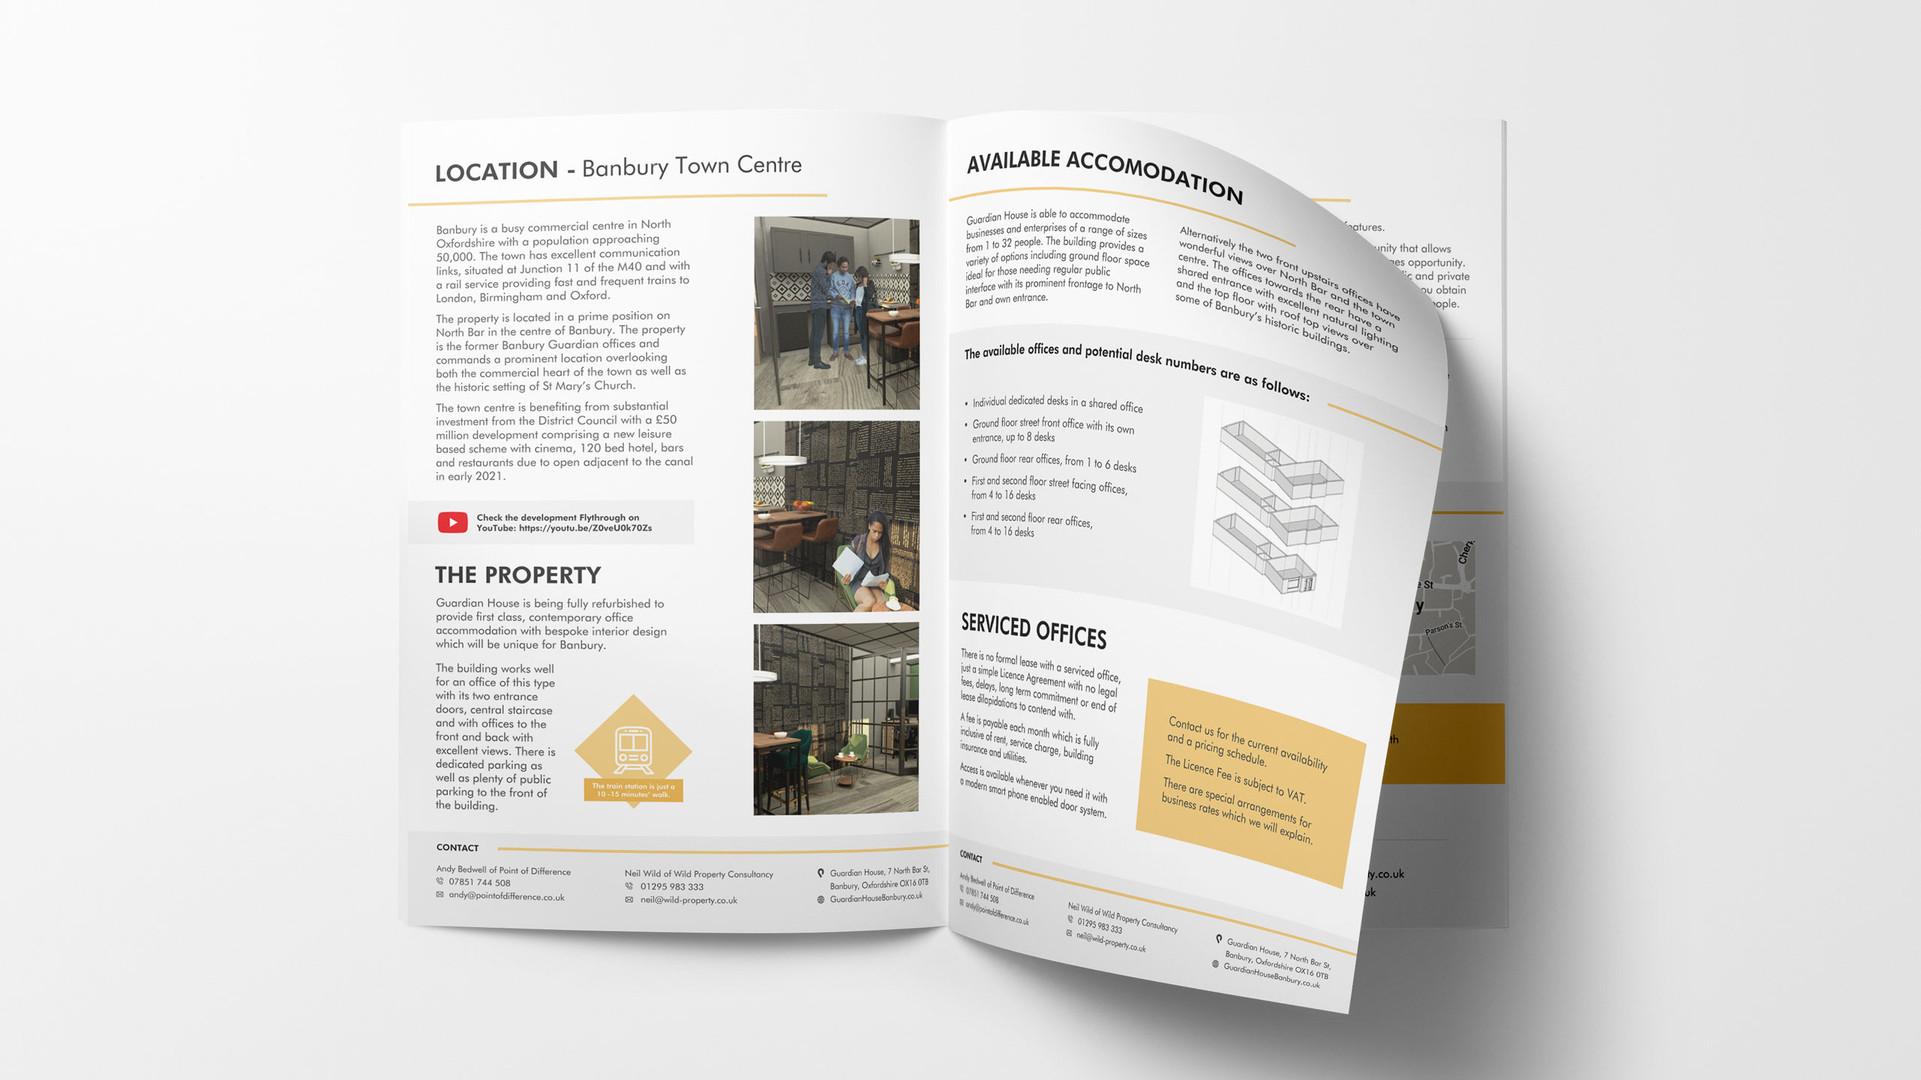 GuardianHouse-InformationBooklet.jpg